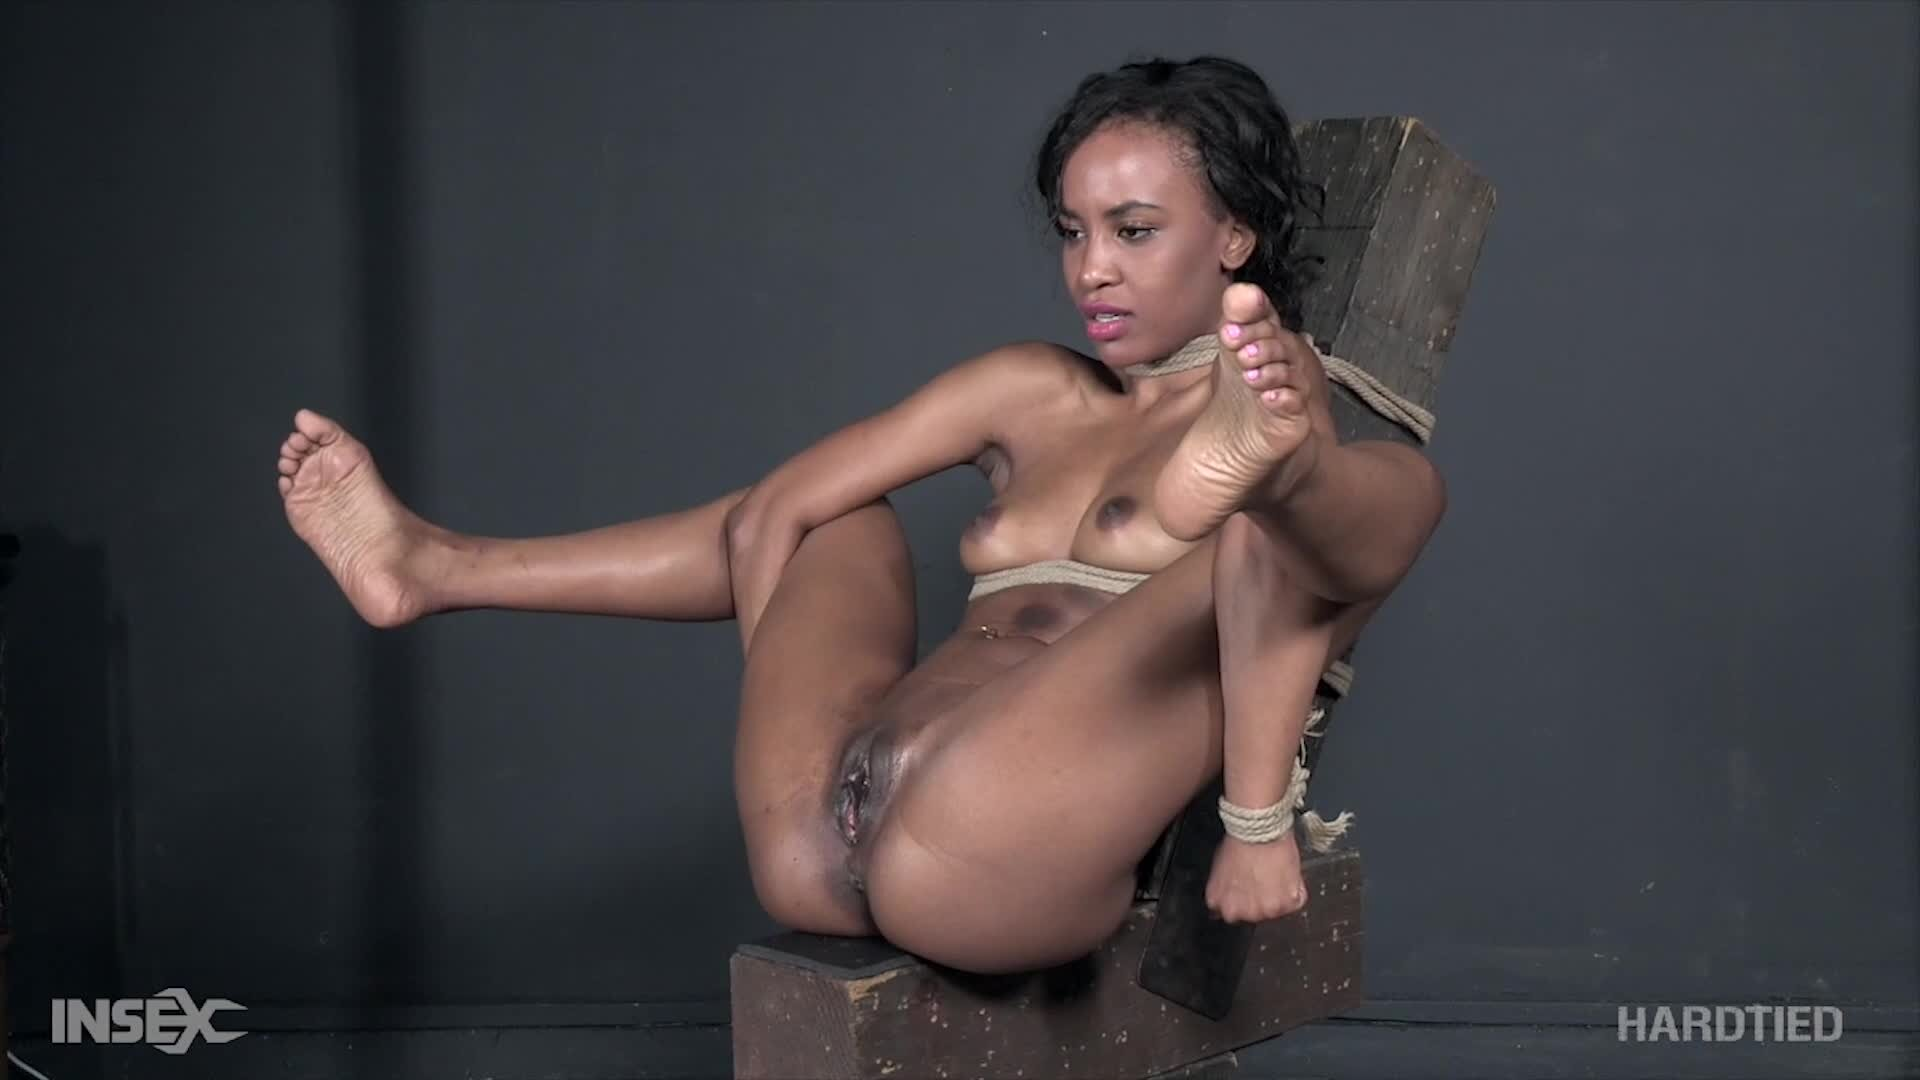 Black Video Hoes Nude Pics Jpg